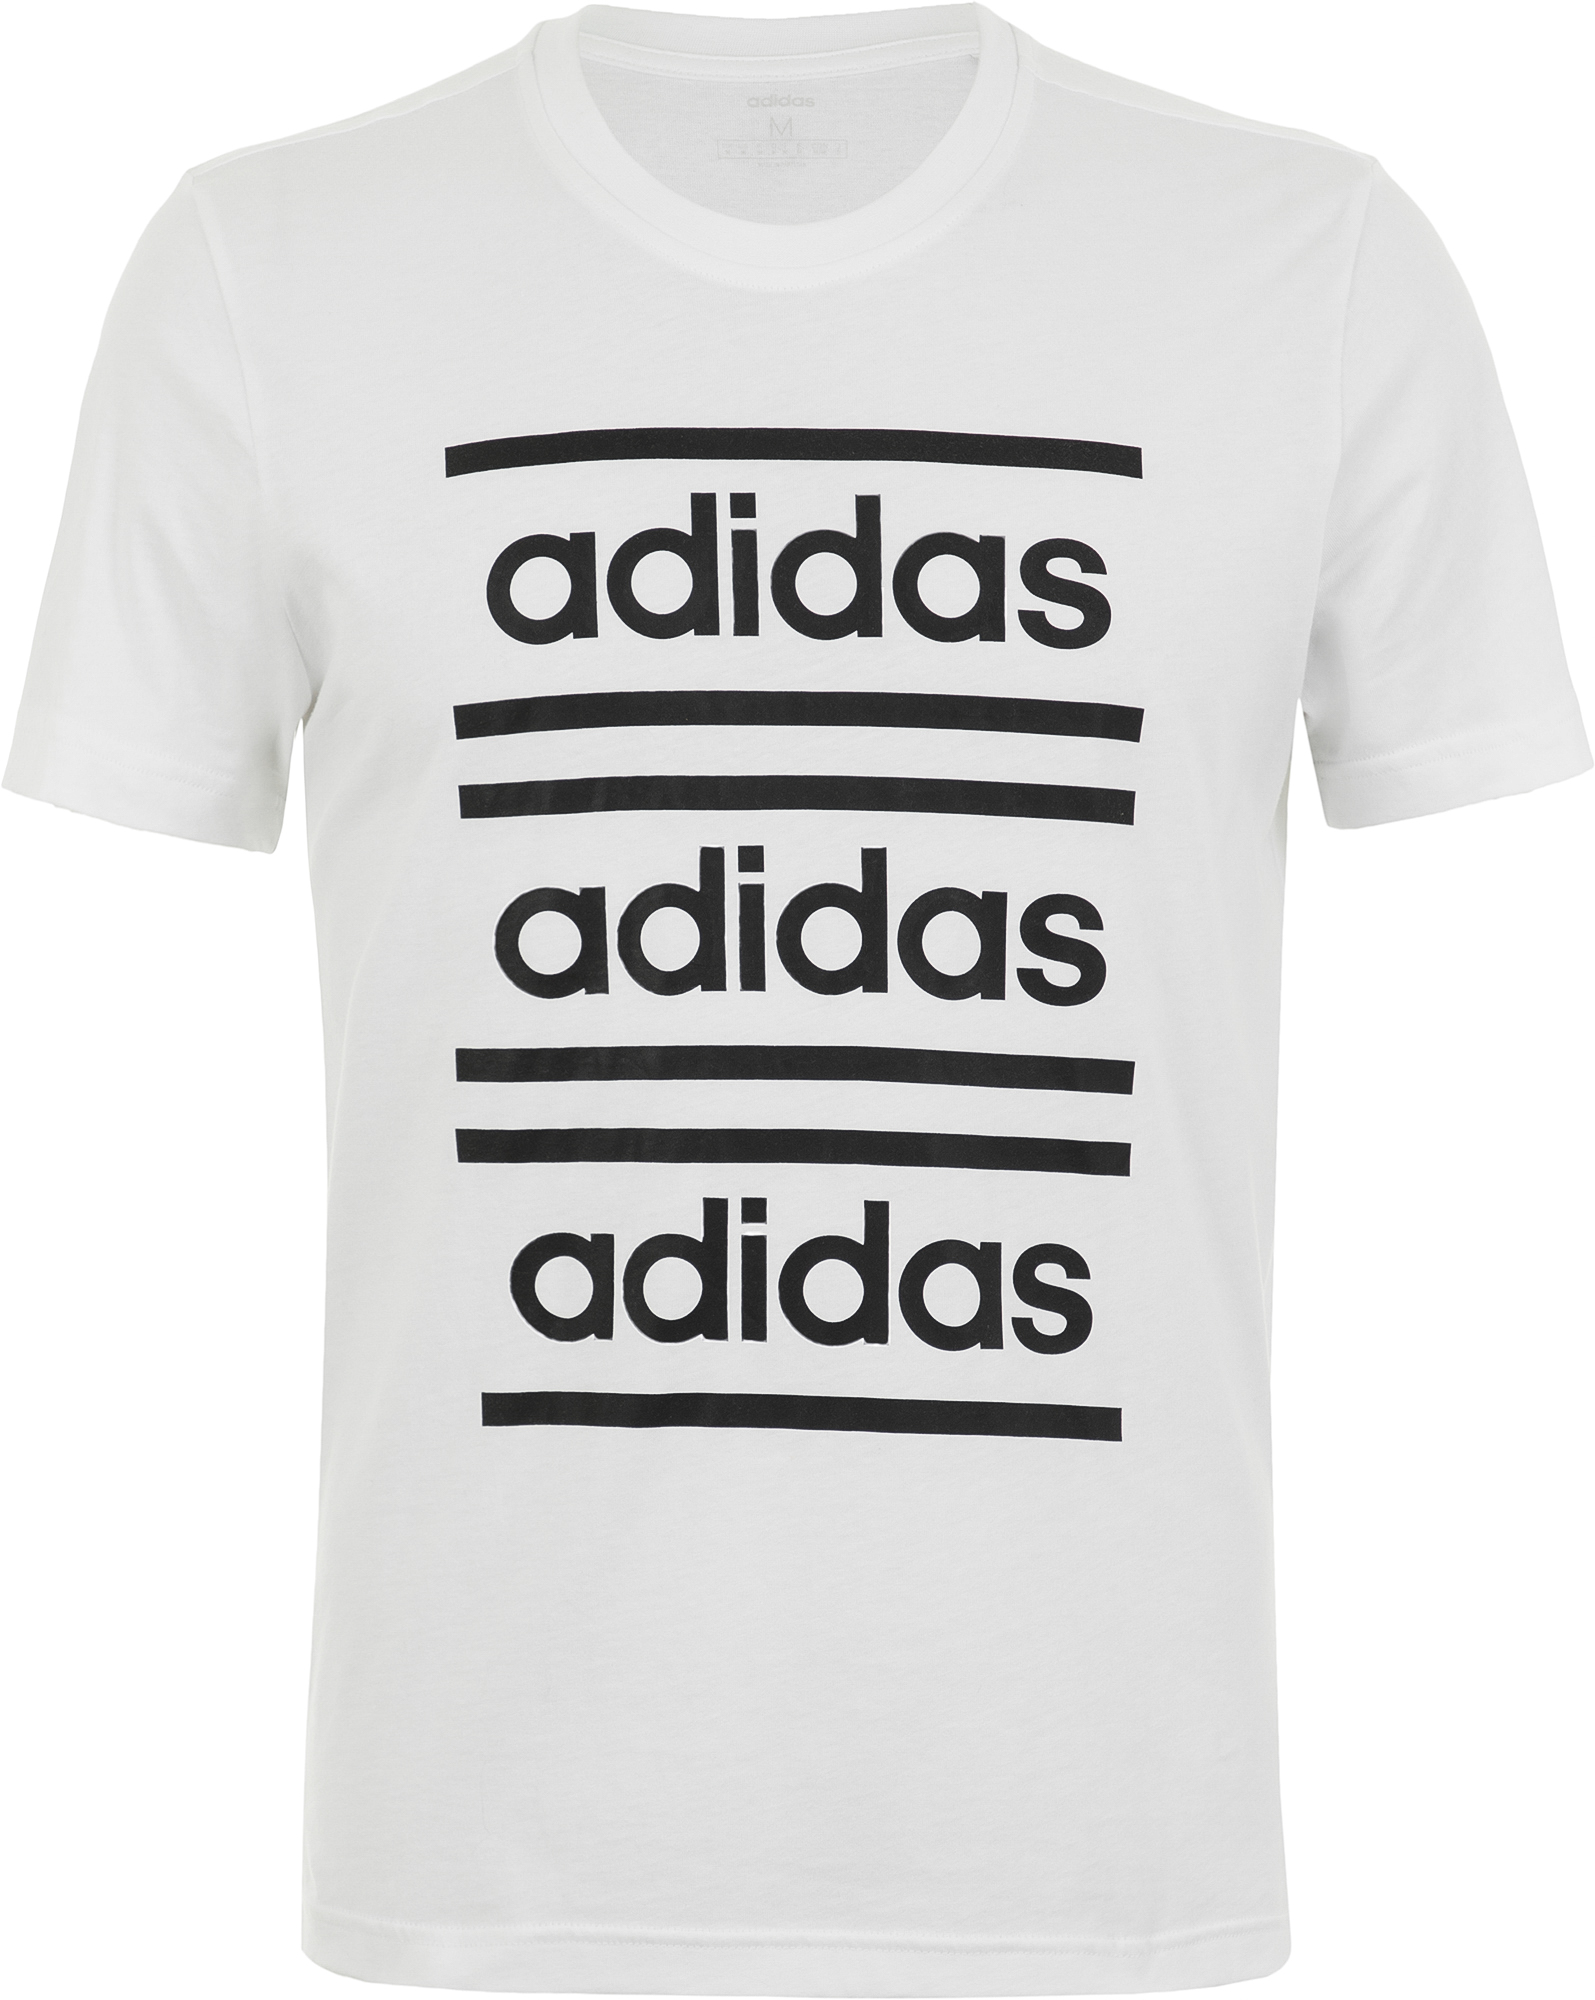 Adidas Футболка мужская Celebrate the 90s, размер 54